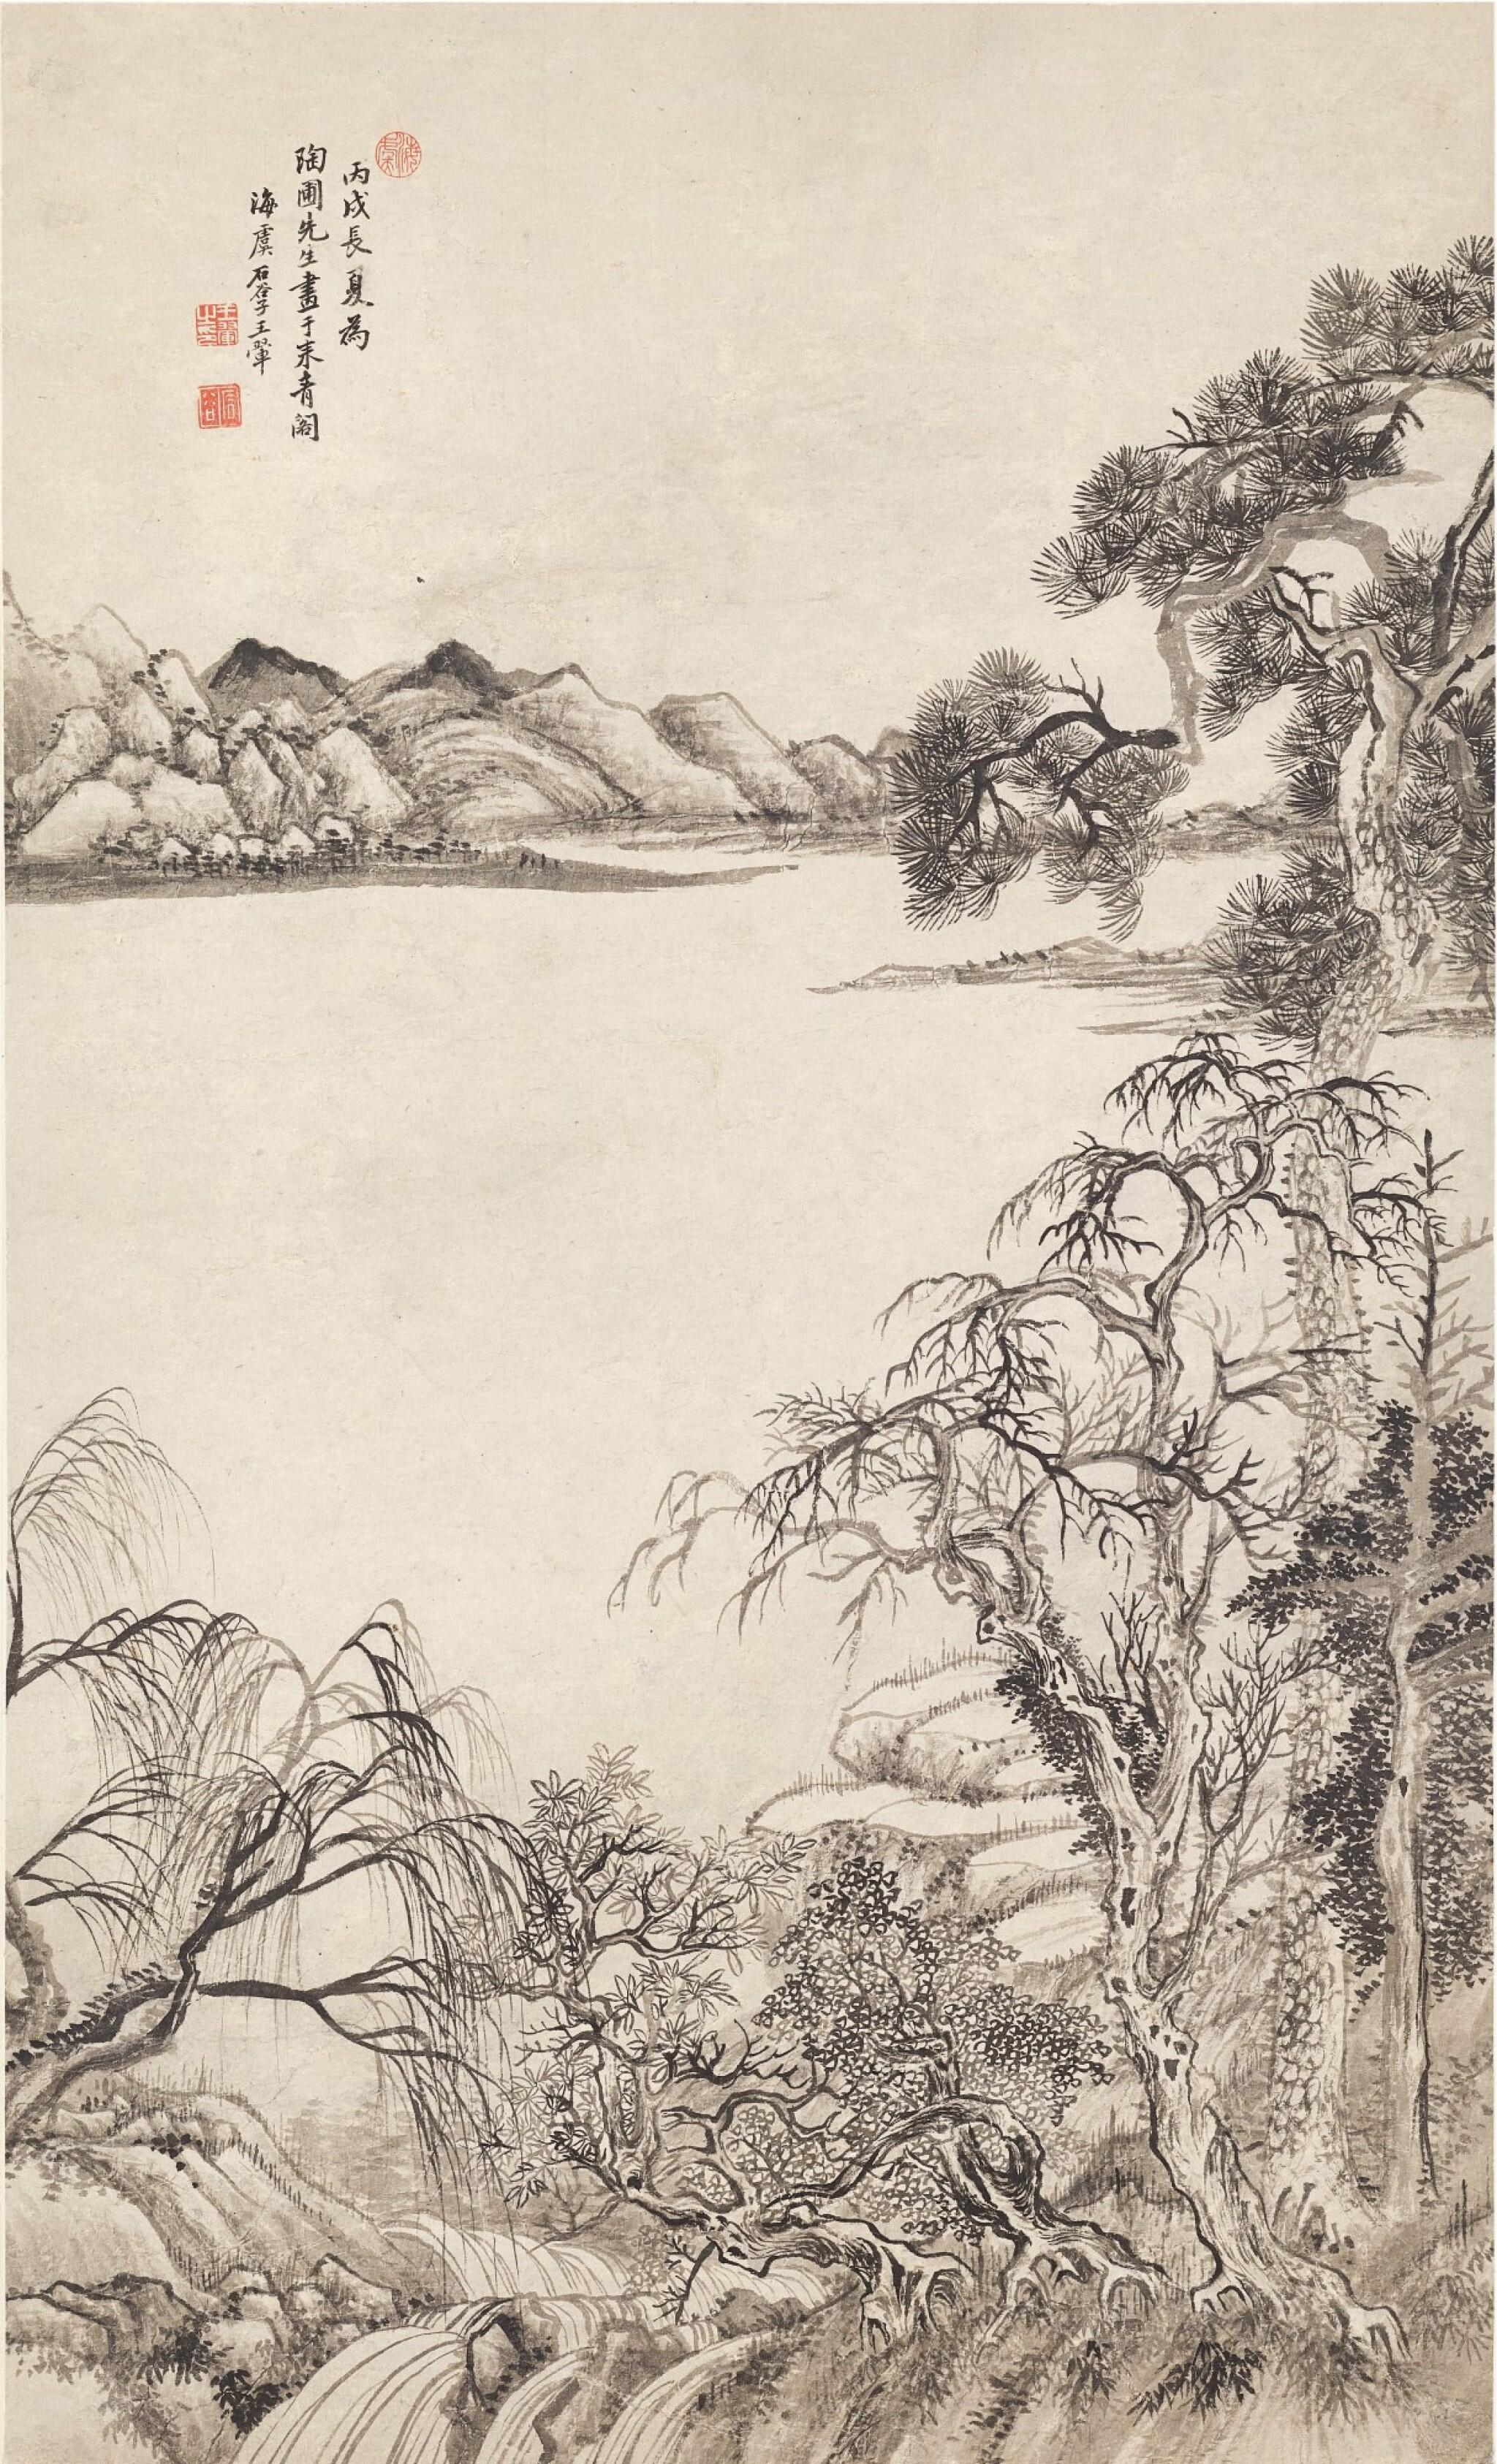 View full screen - View 1 of Lot 3079. Wang Hui 1632 - 1717 王翬 1632-1717 | Landscape 山水.